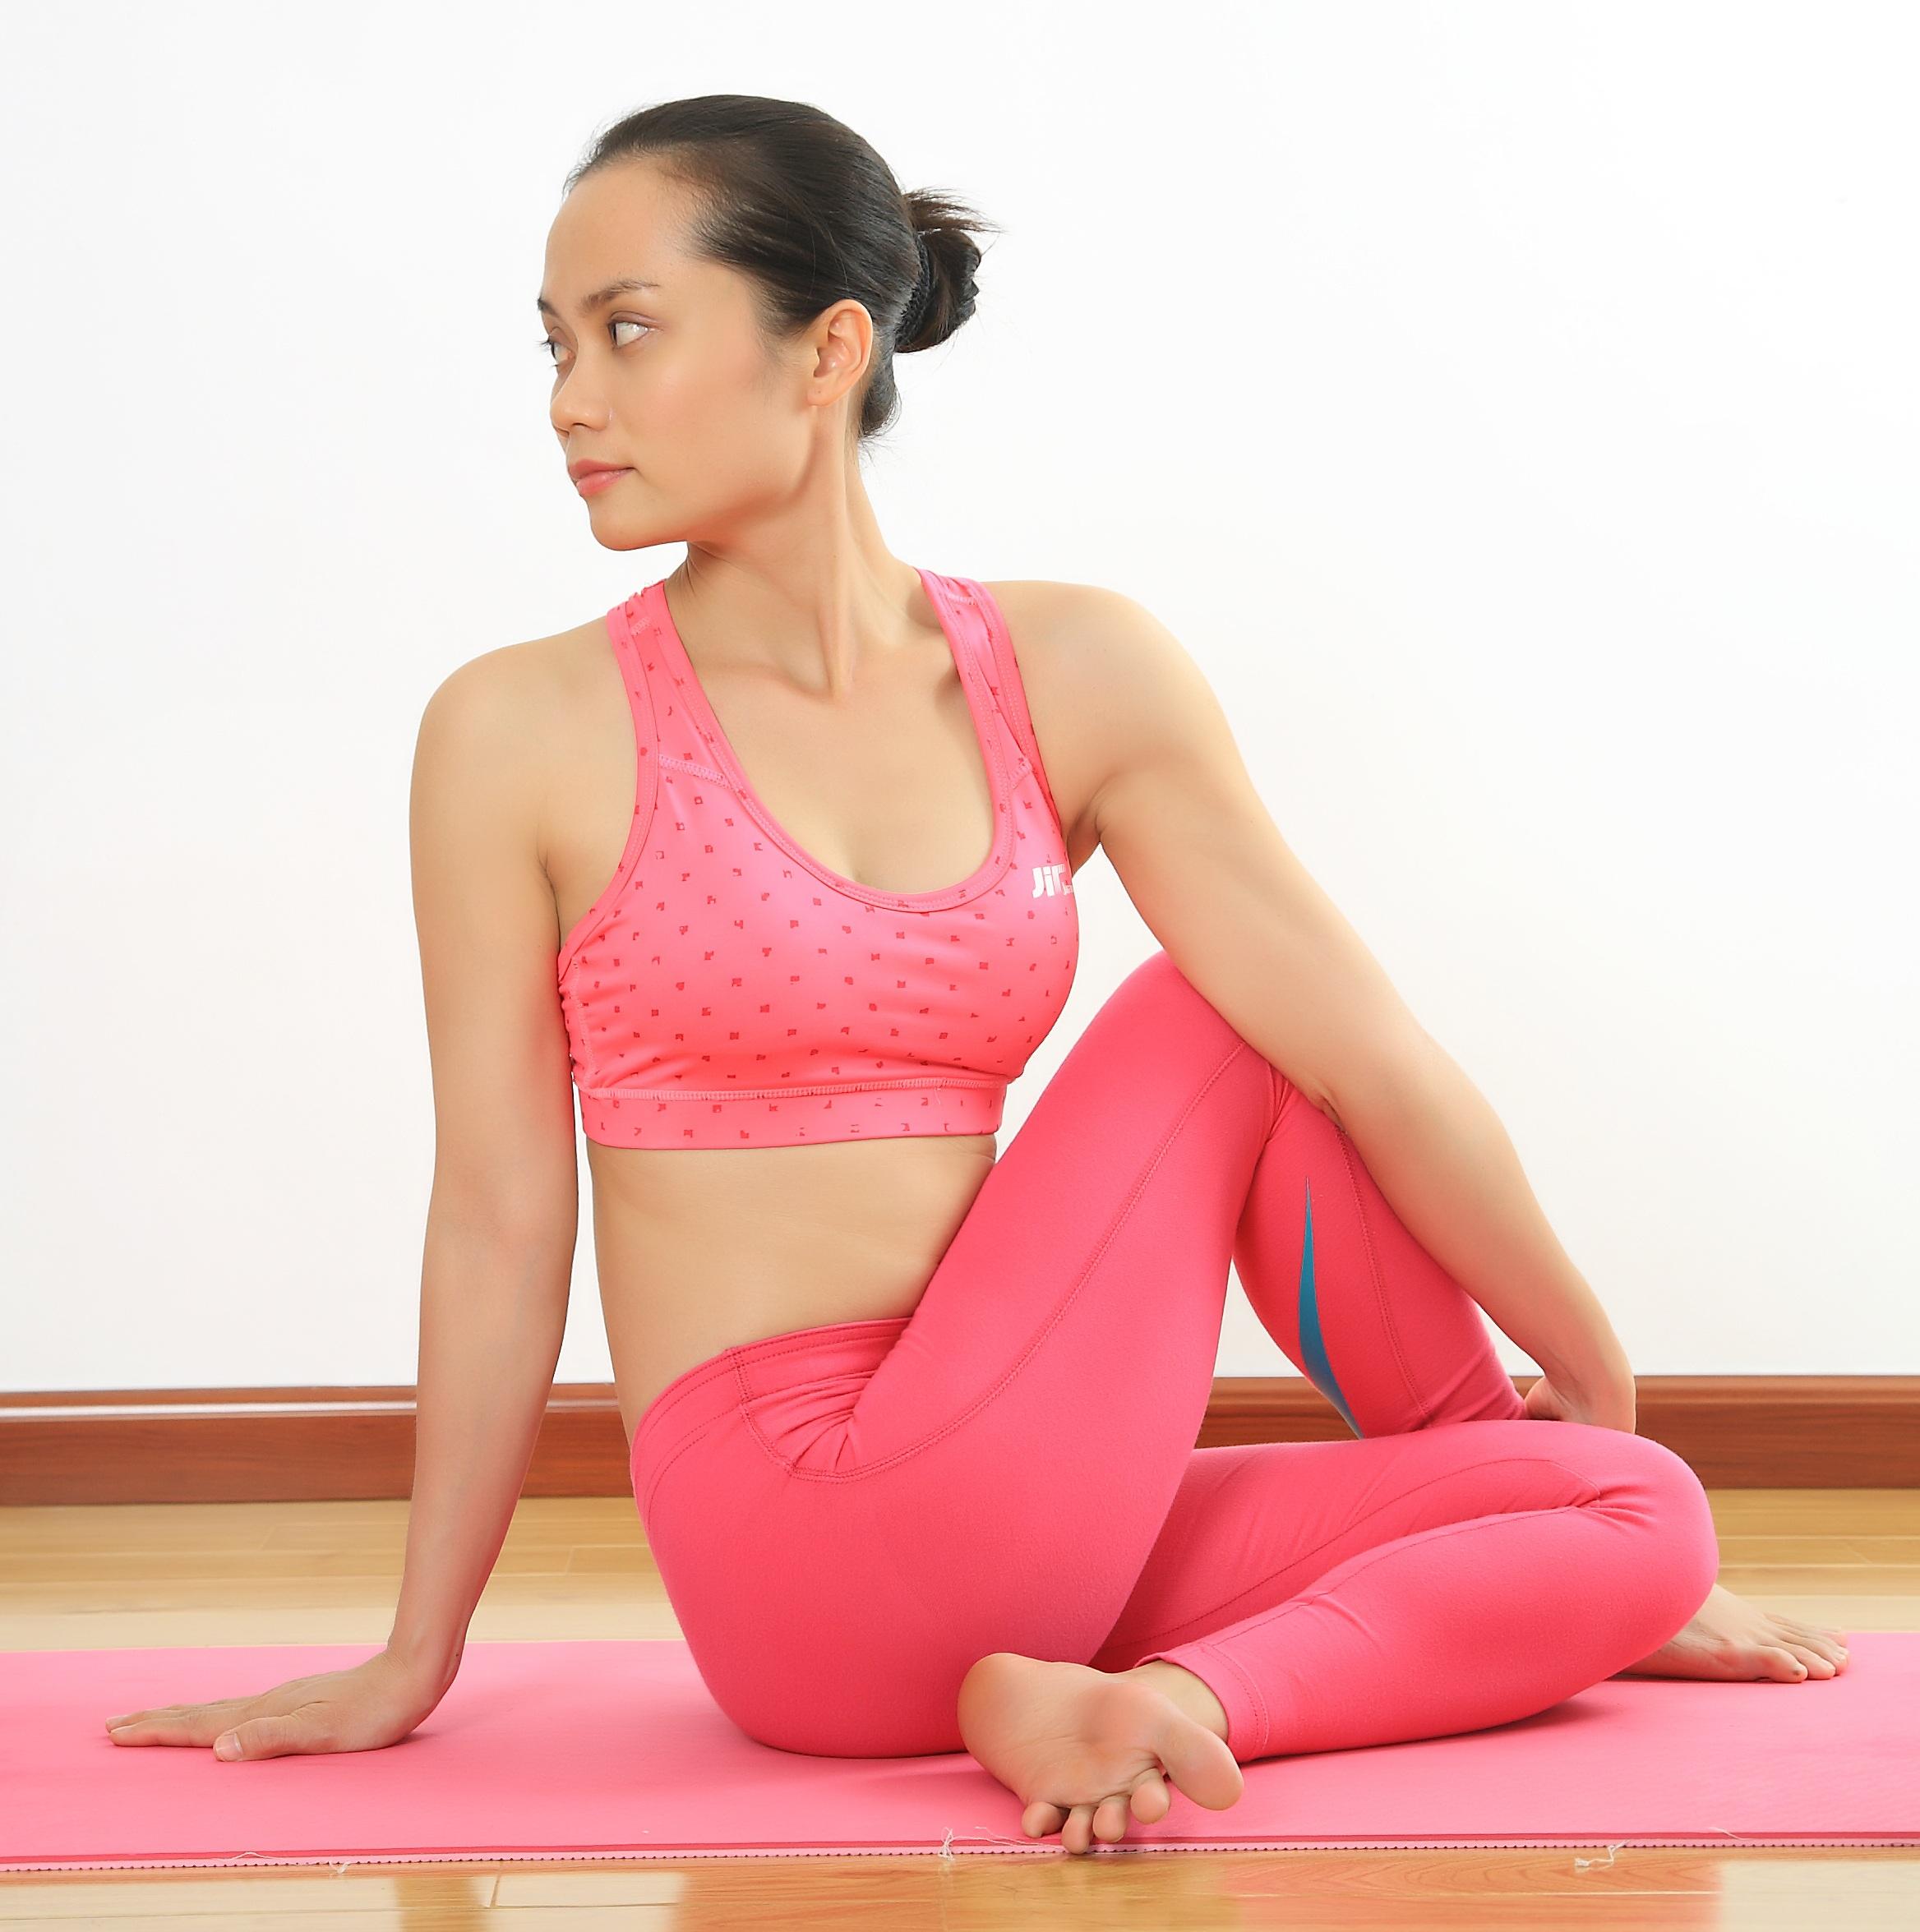 meo-chua-dau-moi-vai-gay-nho-tap-yoga-5